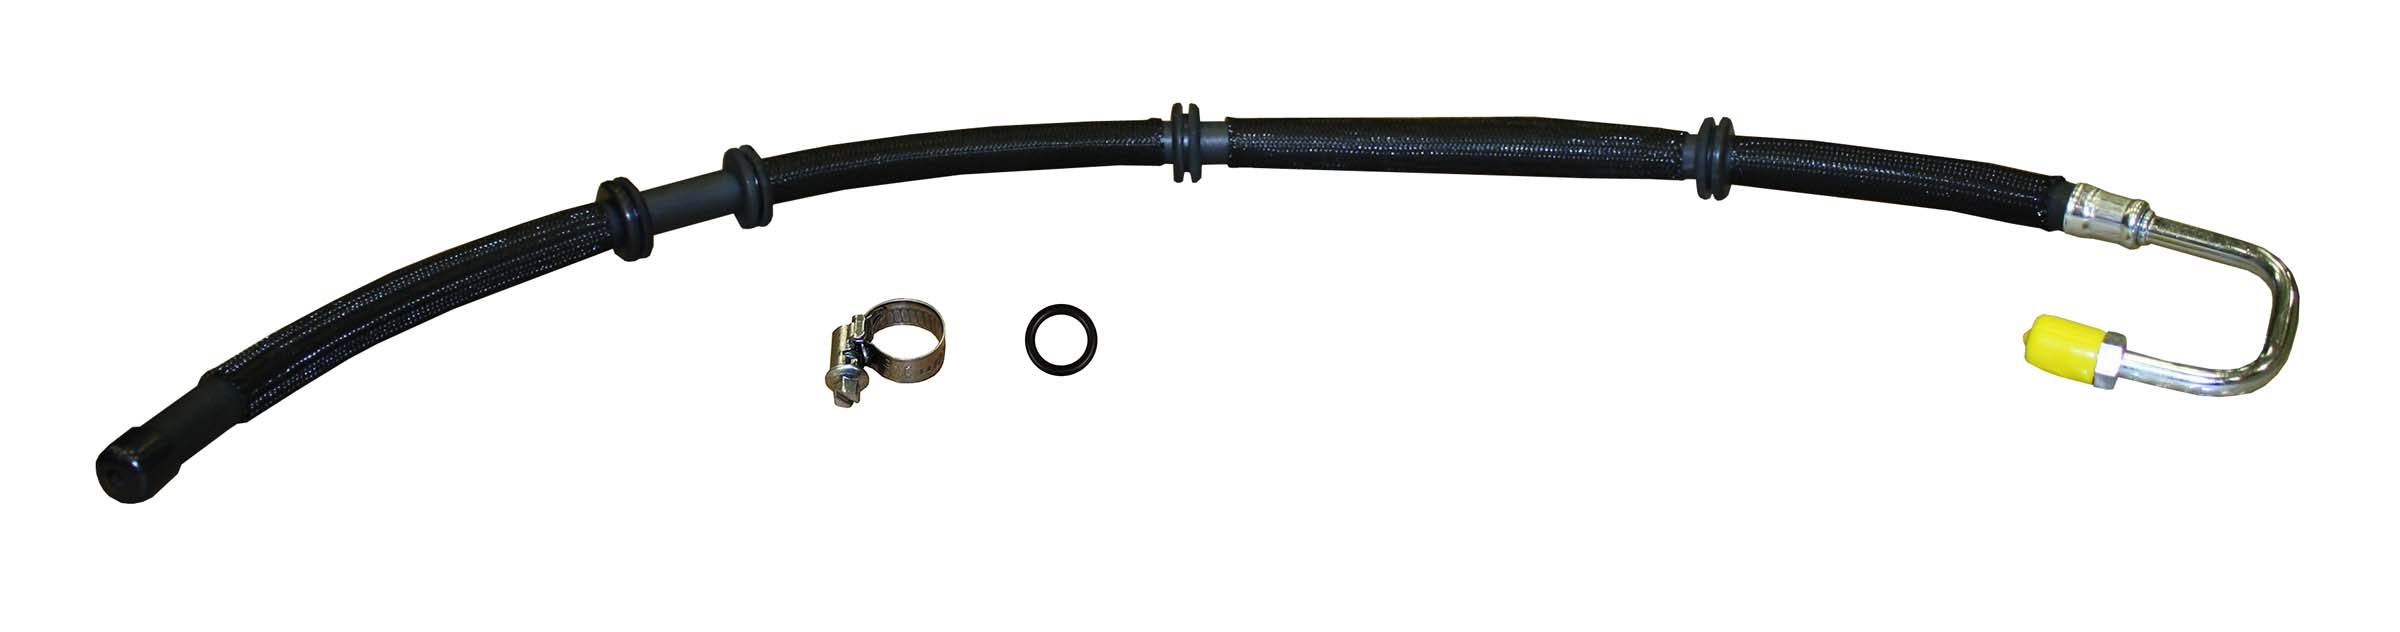 2 UPPER /& 2 LOWER A-ARM BALL JOINT KITS SUZUKI 87-93 LT230E QUAD RUNNER LT-230E